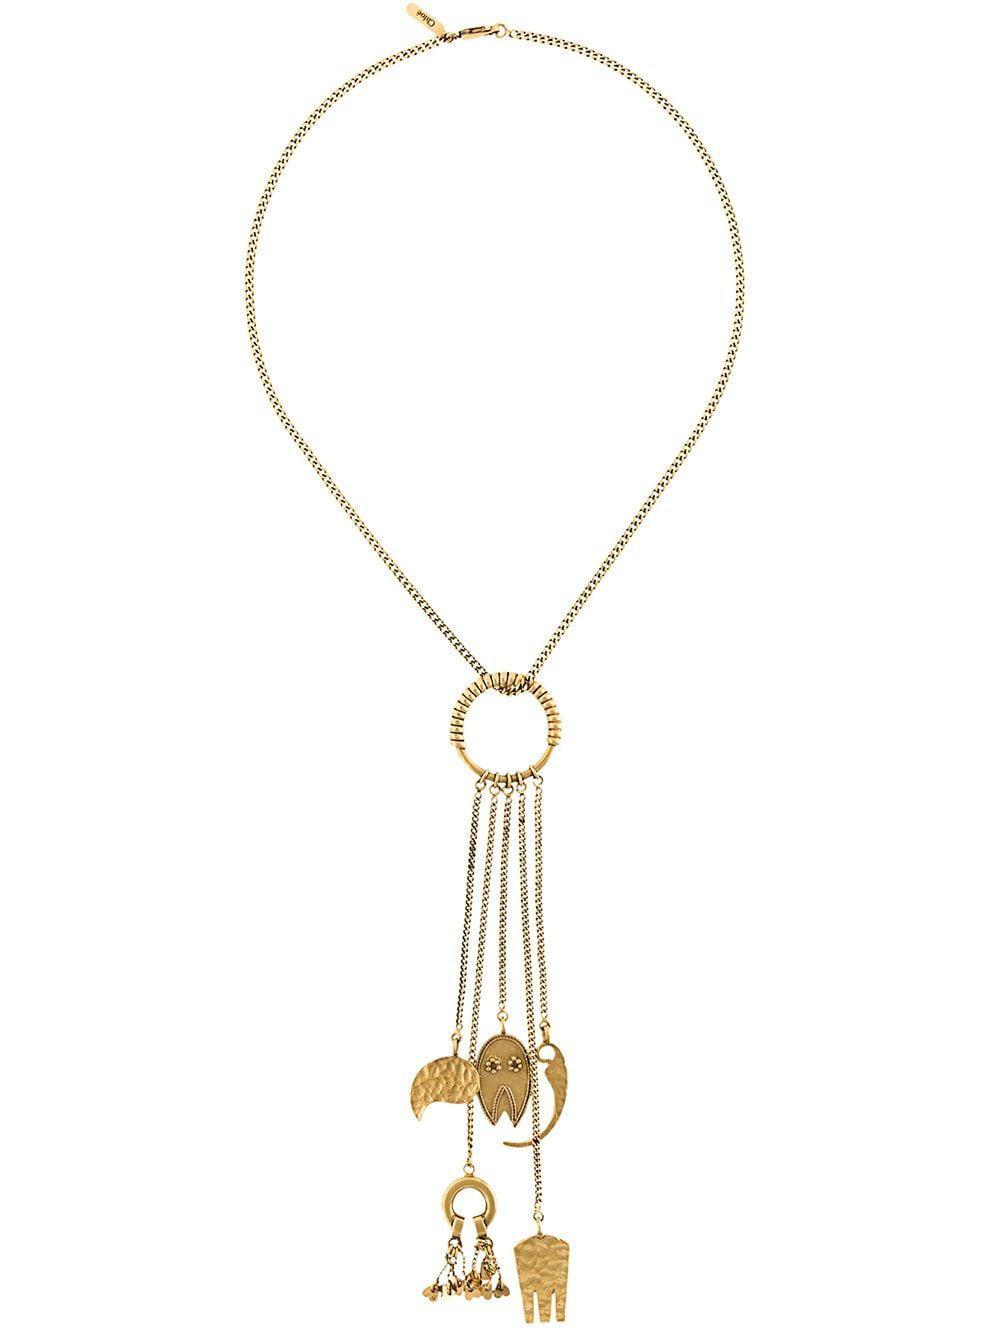 Chloé 'lyzbeth' Necklace in Metallic